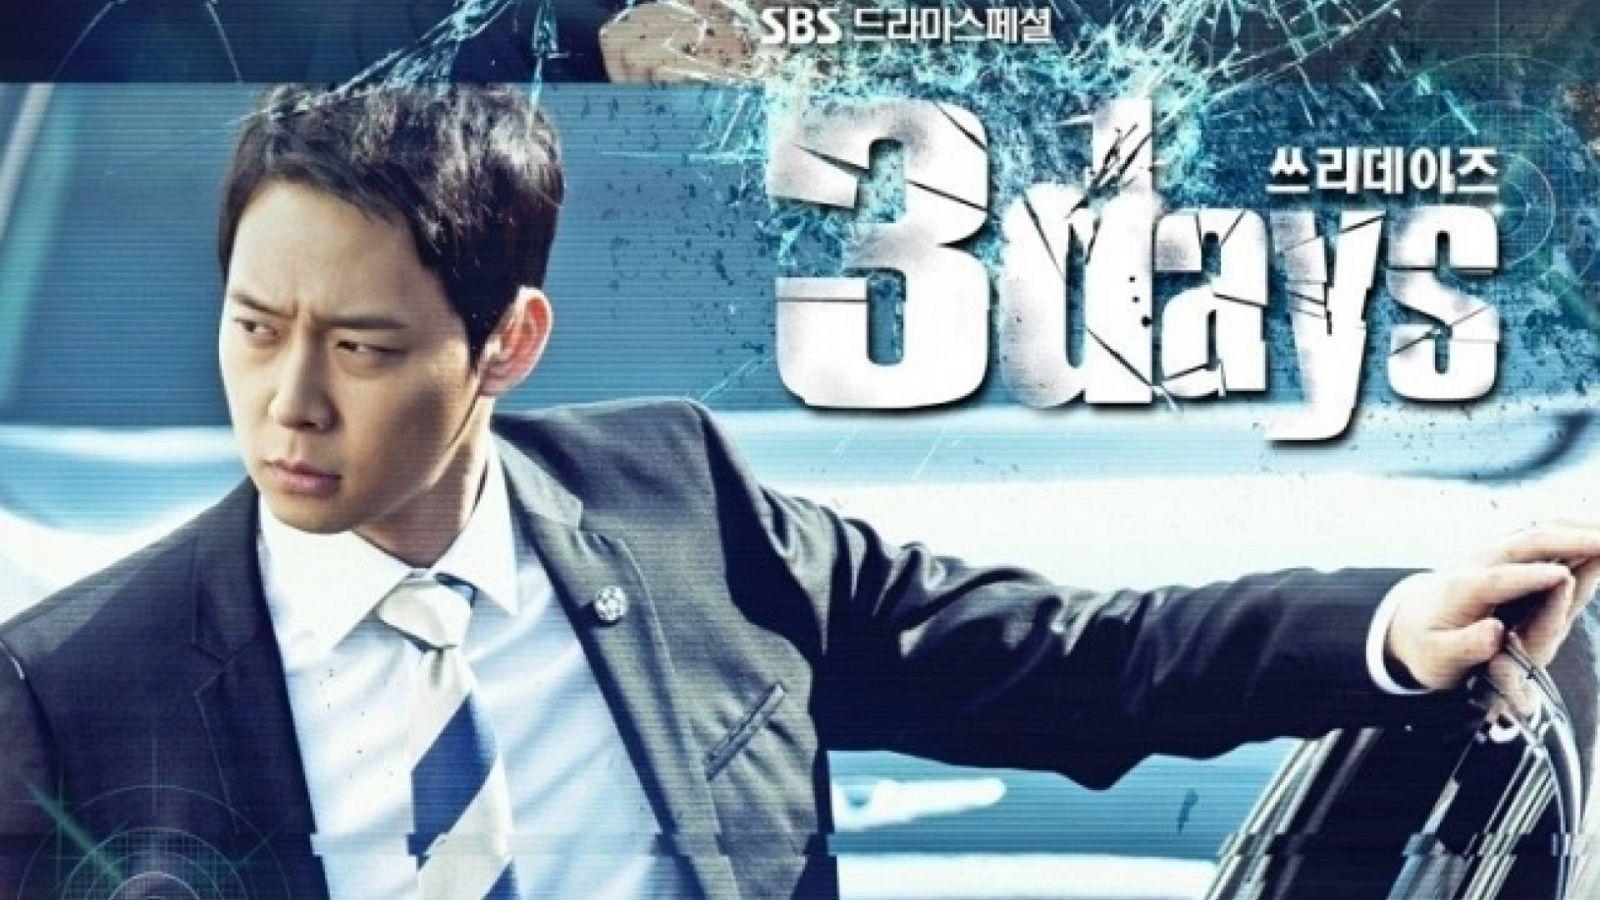 Lim Changjungin balladi 3 Daysin soundtrackille © All Rights Reserver